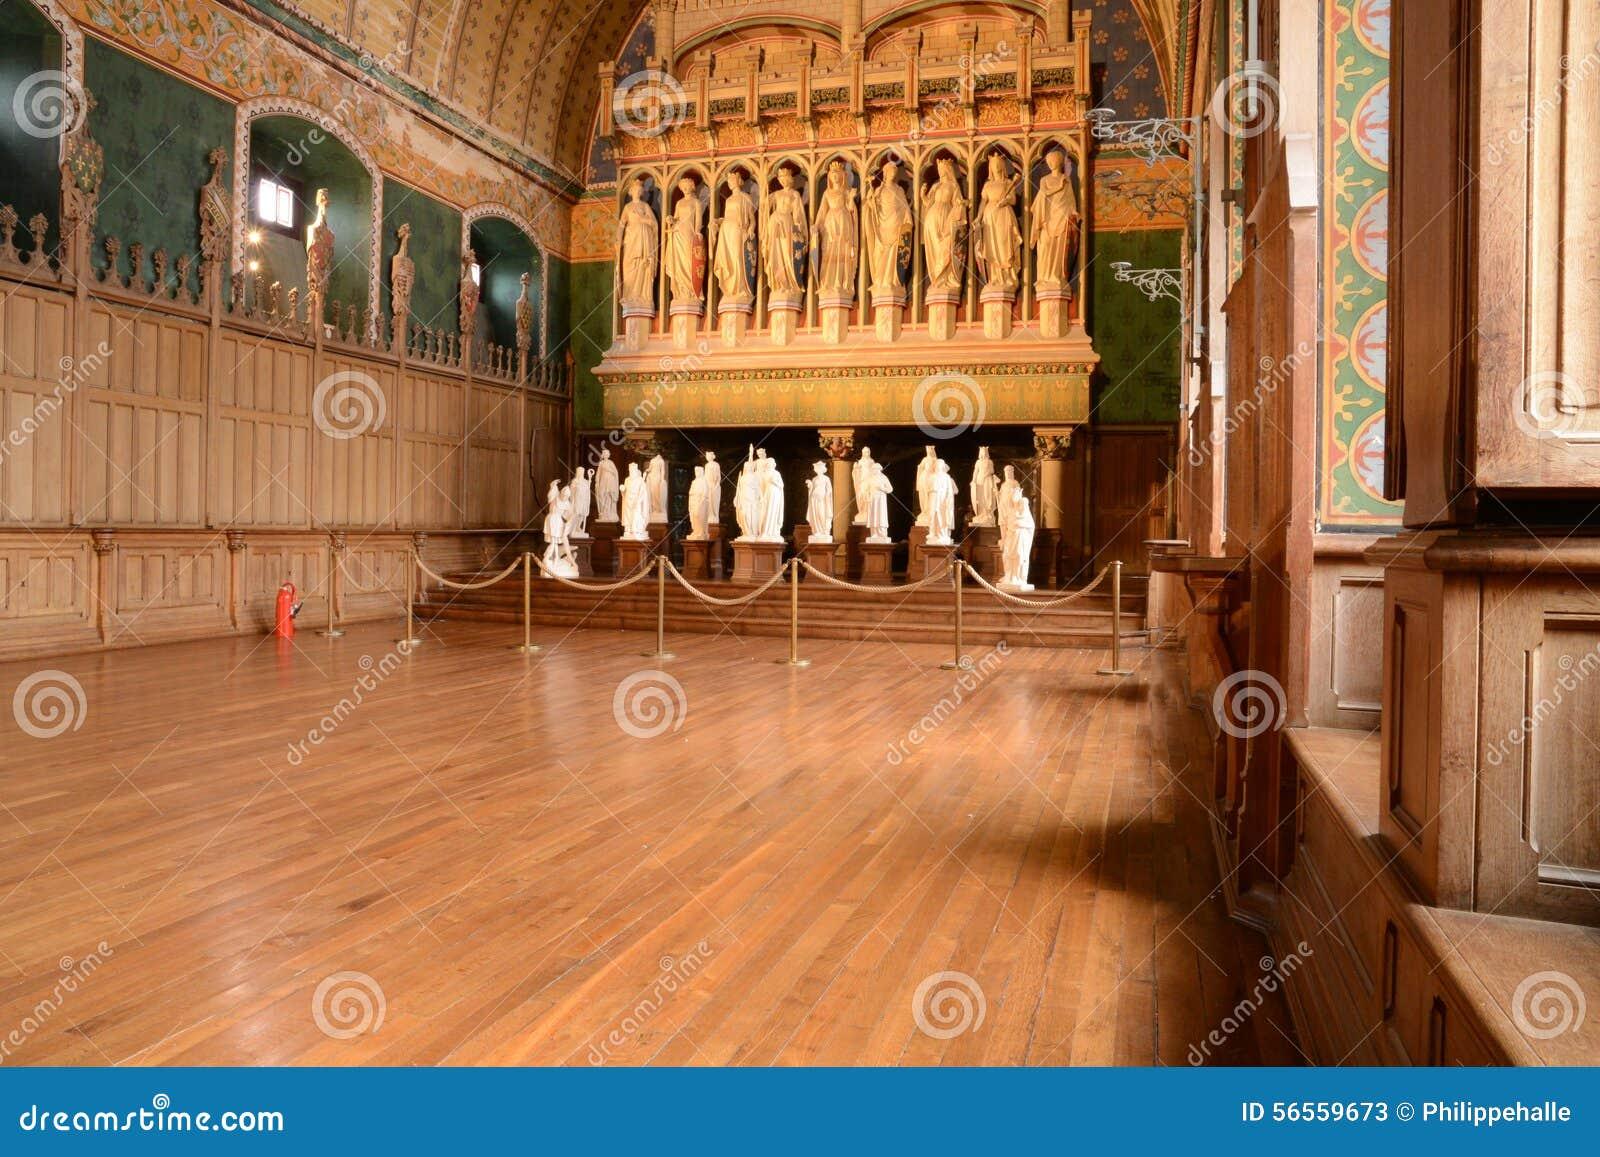 Download Γαλλία, ιστορικό κάστρο Pierrefonds σε Picardie Στοκ Εικόνα - εικόνα από παλαιός, δωμάτιο: 56559673